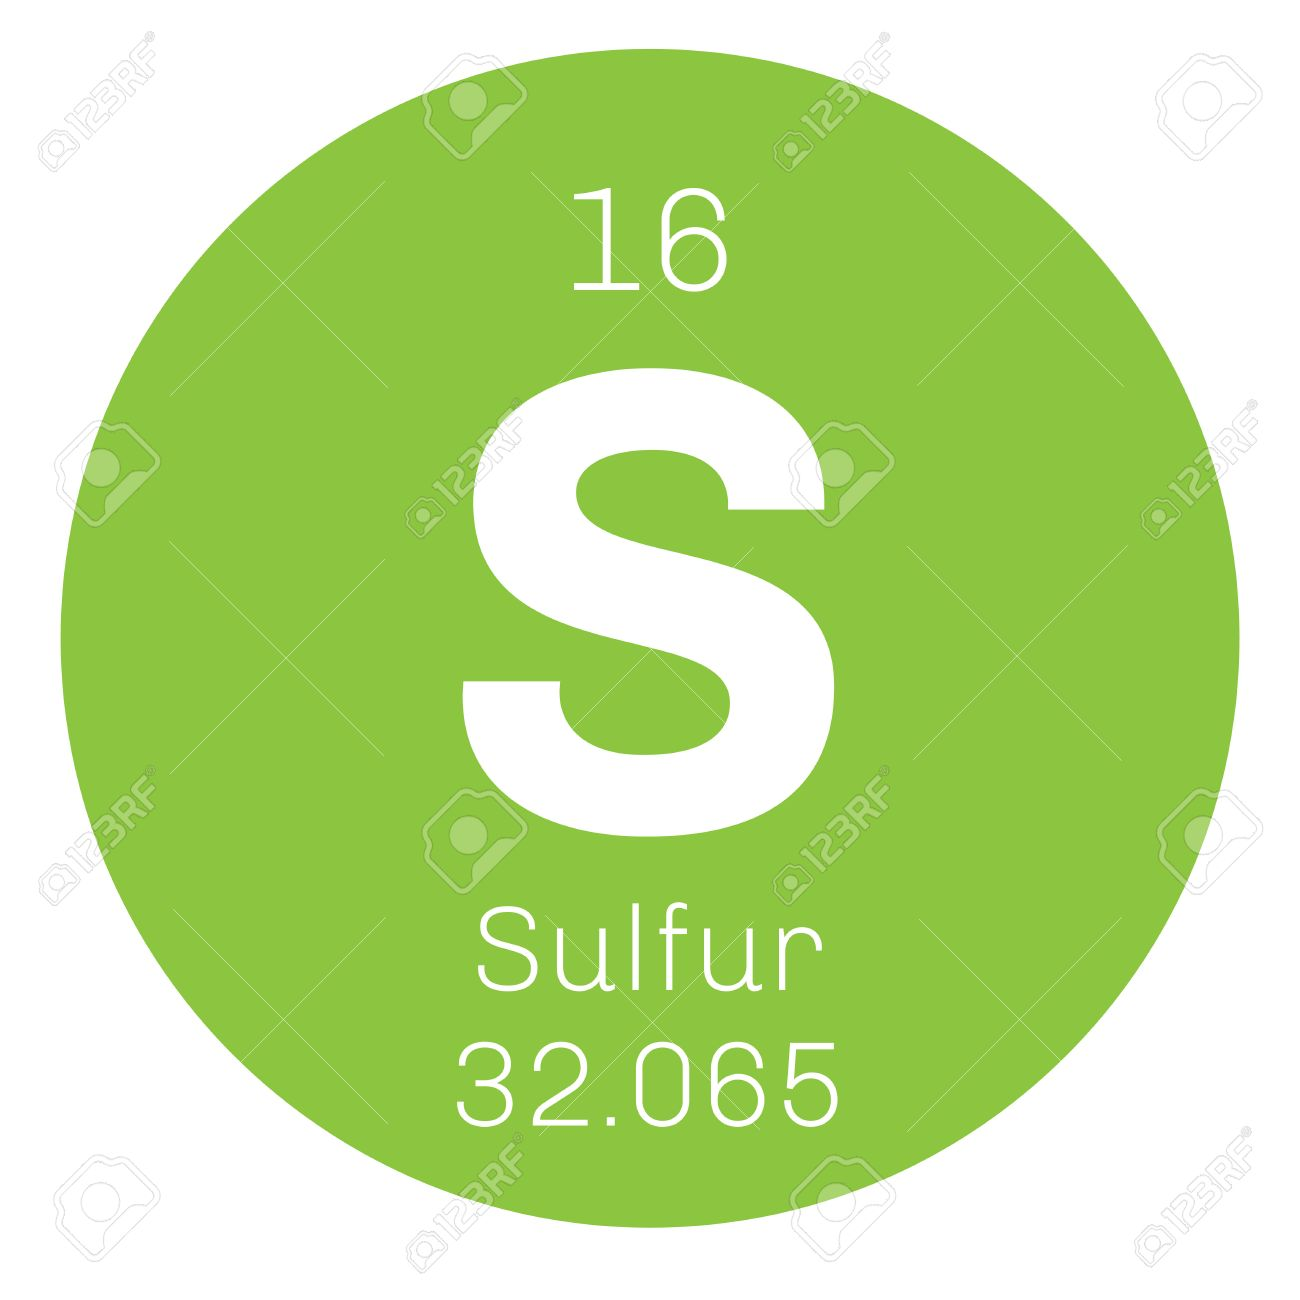 Sulfur chemical element abundant non metal element colored sulfur chemical element abundant non metal element colored icon with atomic number and urtaz Gallery